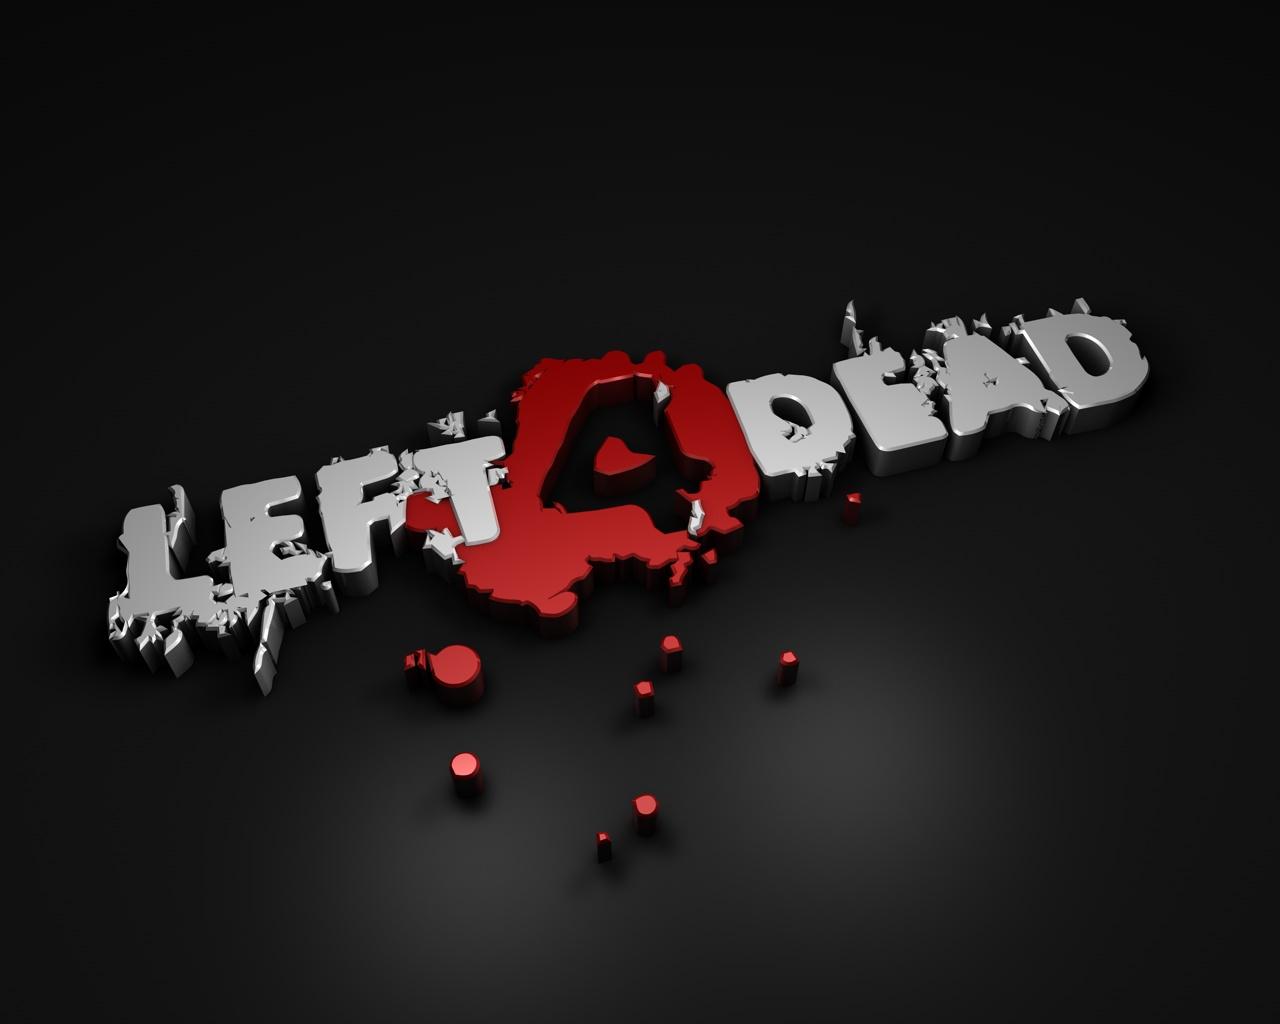 http://2.bp.blogspot.com/-nSory5-1CGg/TaTqGsiAGLI/AAAAAAAAAFc/a5llJyt5skA/s1600/Left_4_Dead_Wallpaper___Black_by_Vancete.jpg